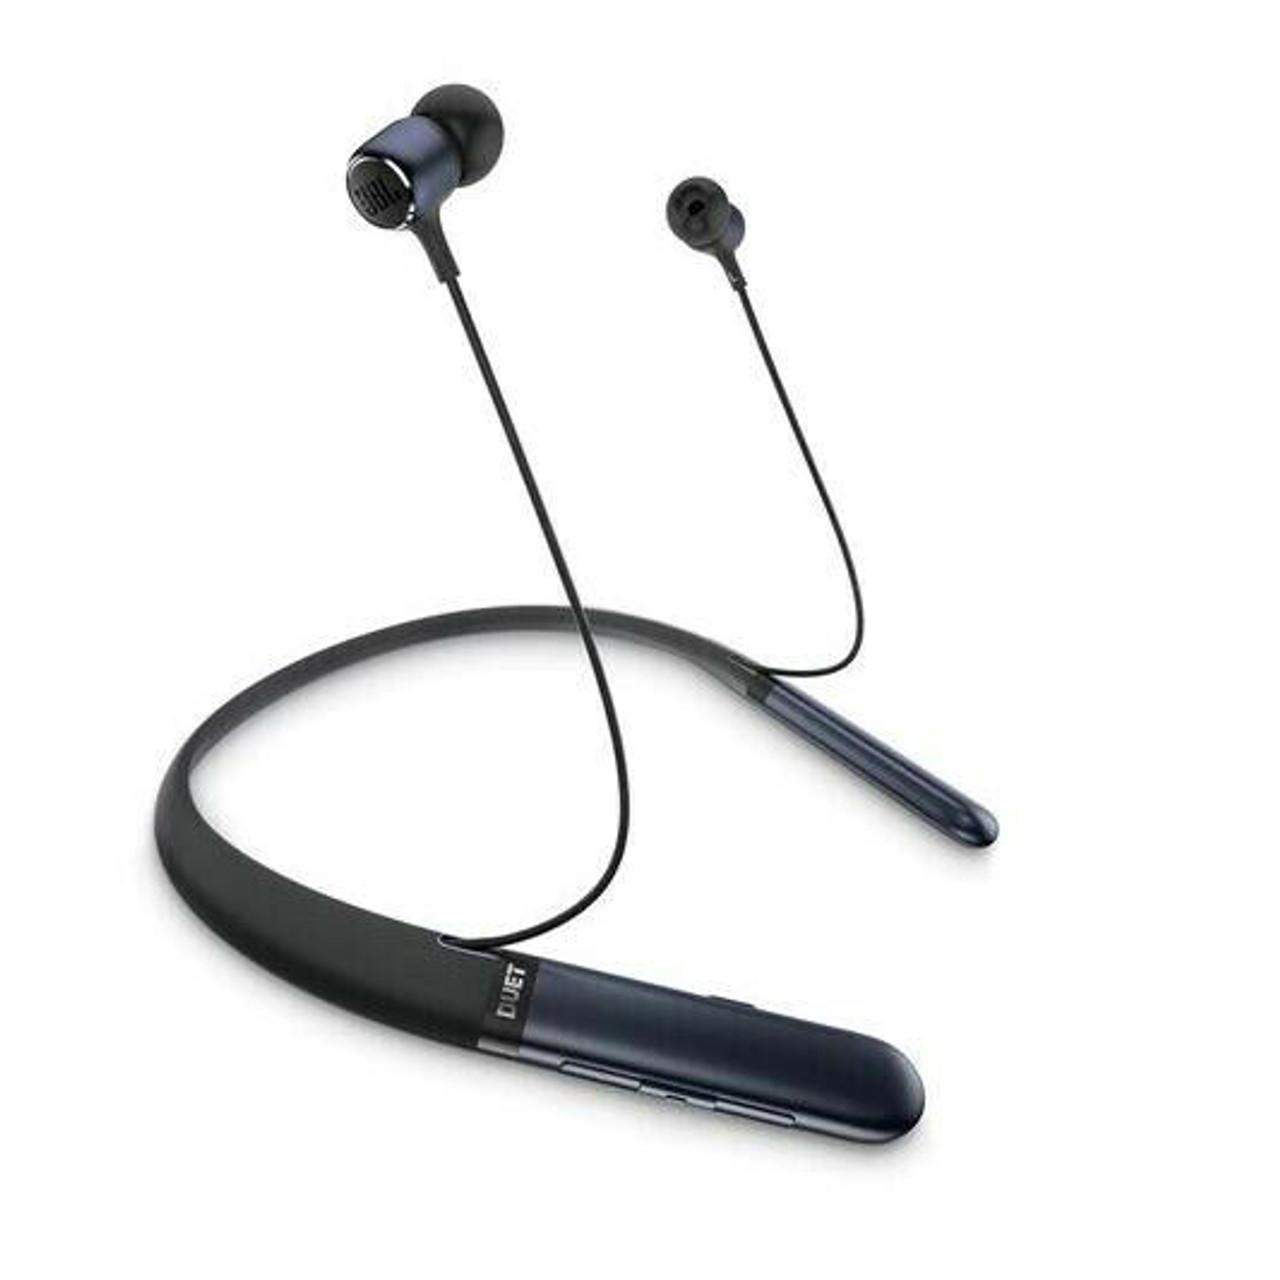 Jbl Duet Arc Bluetooth Wireless Pure Bass Sound Hands Free Calls Headphones Esurebuy Com